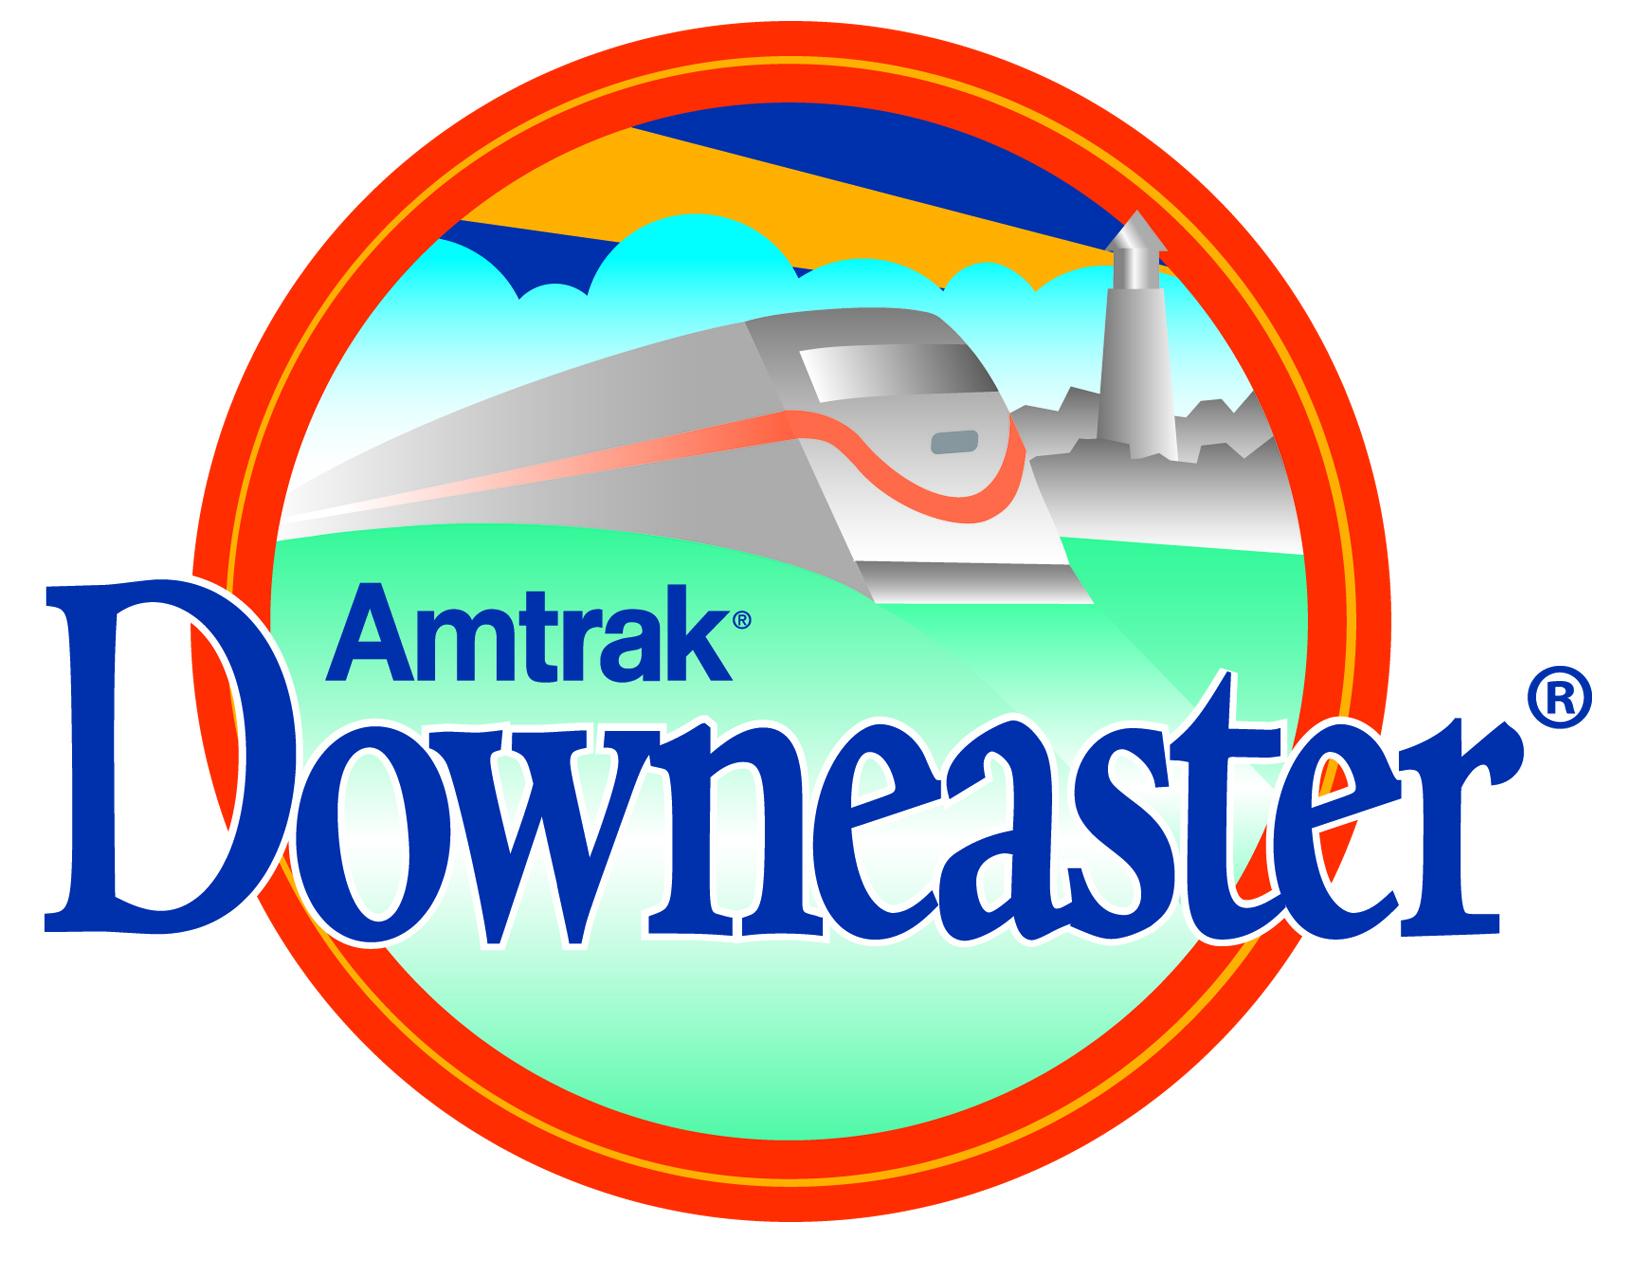 Amtrak.Downeaster_childrens.series.jpg